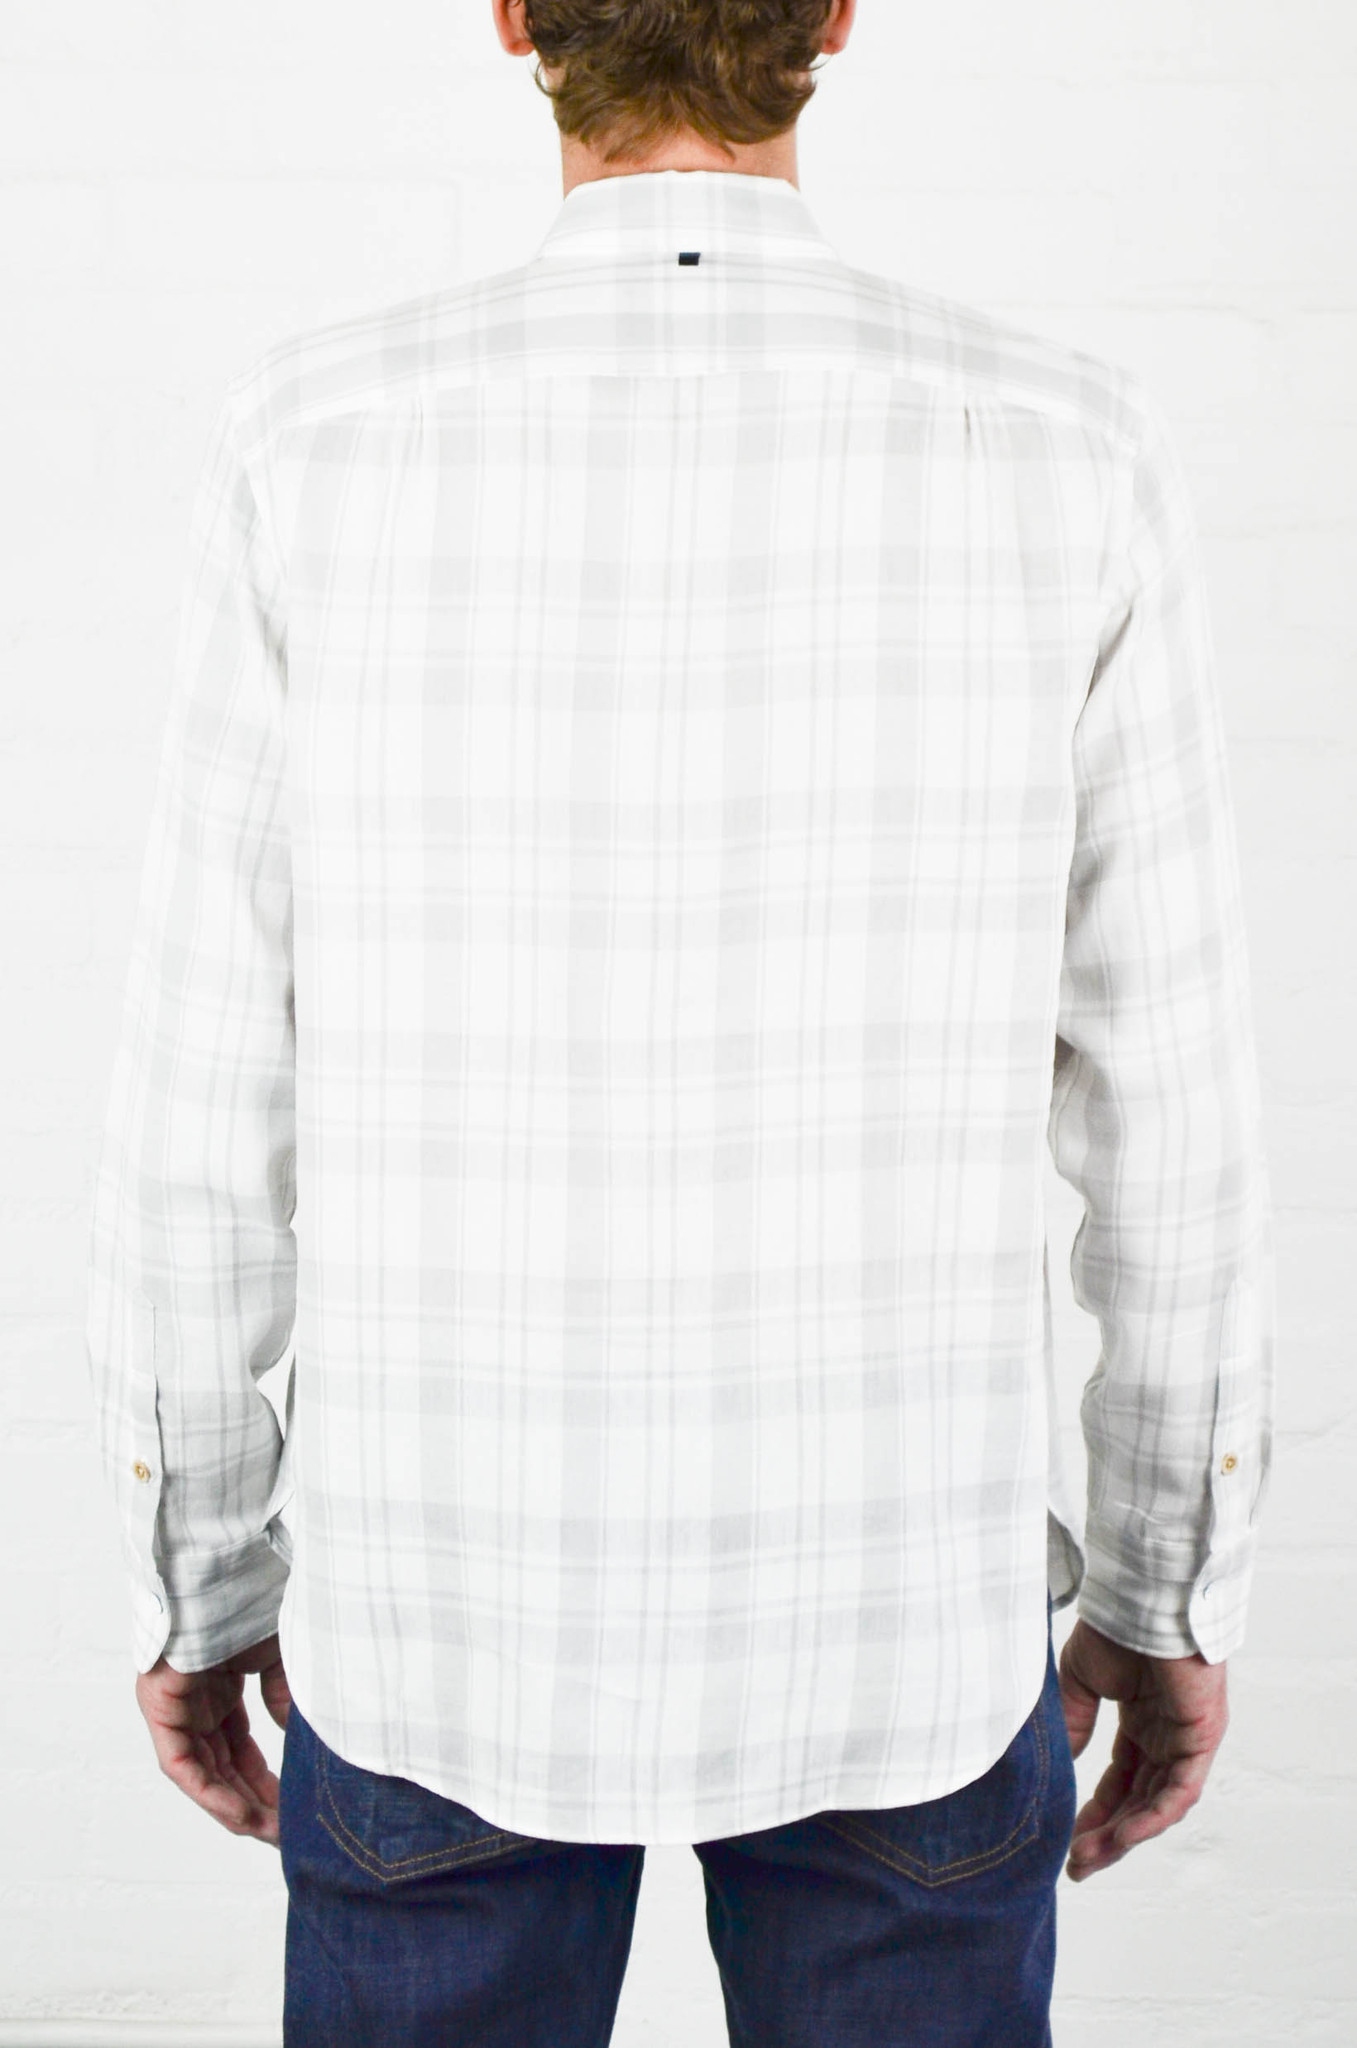 Rag bone white and grey beach shirt in white for men lyst for Rag and bone white t shirt